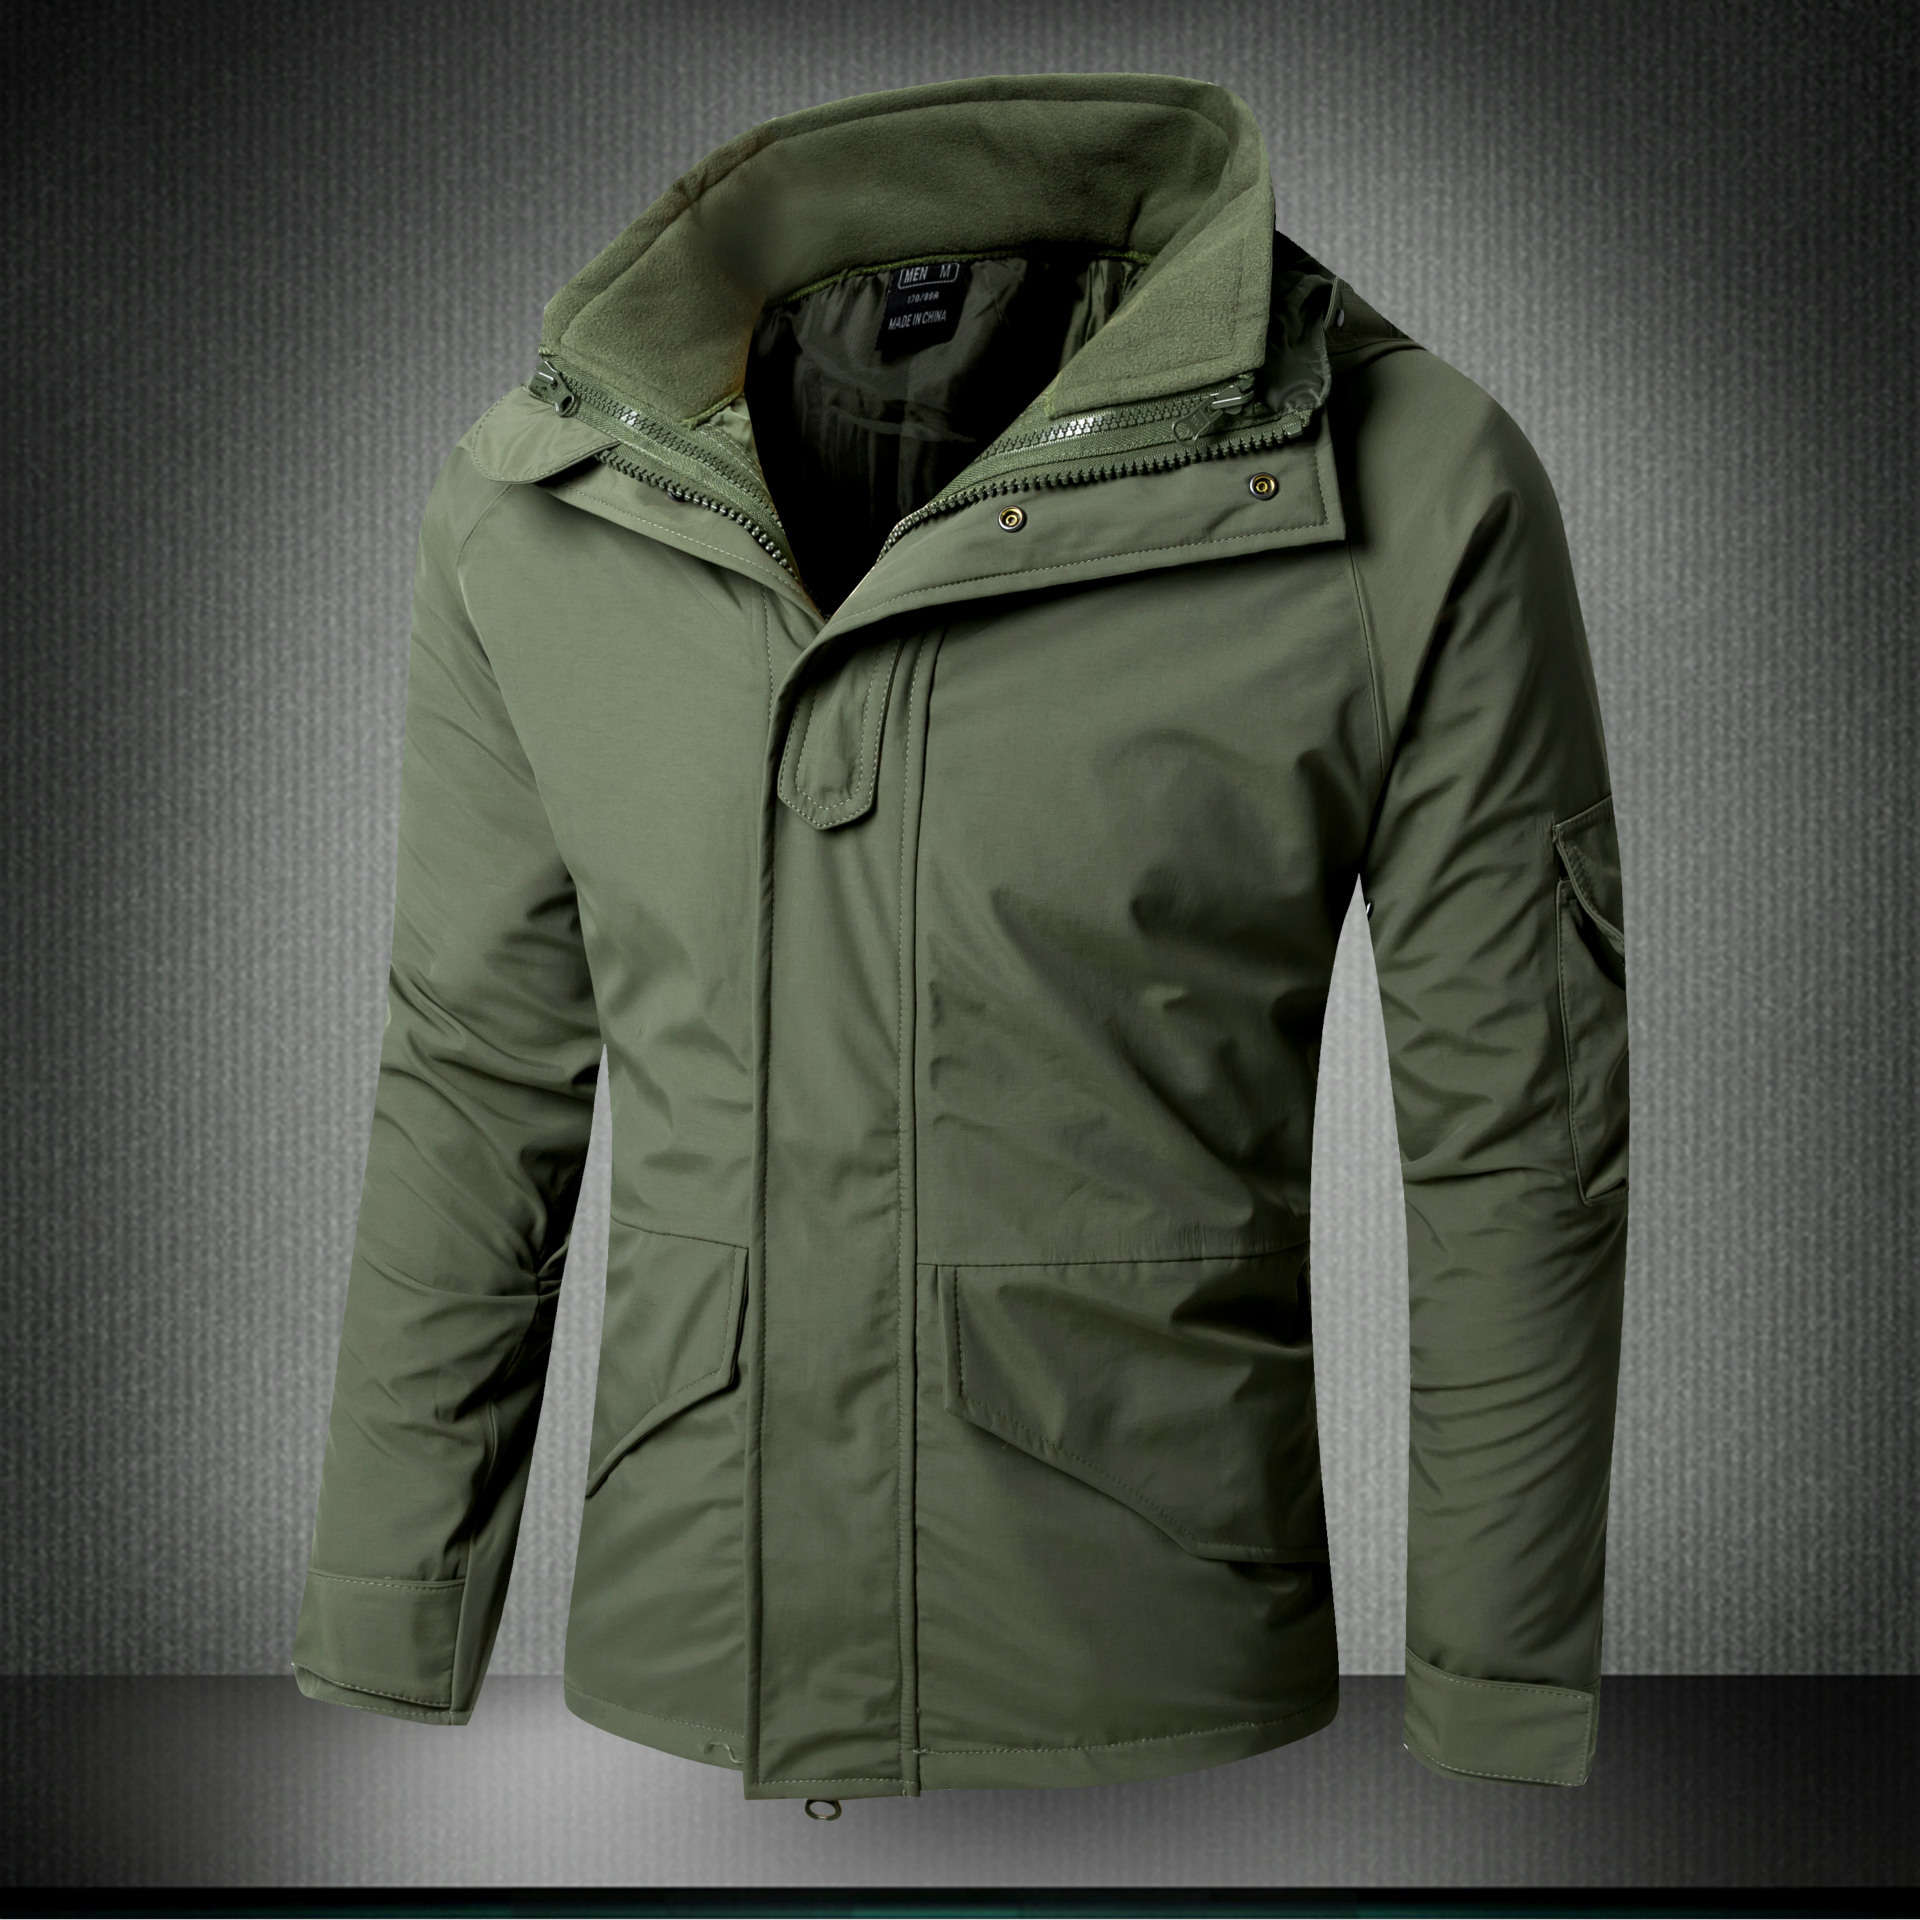 Online Get Cheap Cool Waterproof Jackets -Aliexpress.com | Alibaba